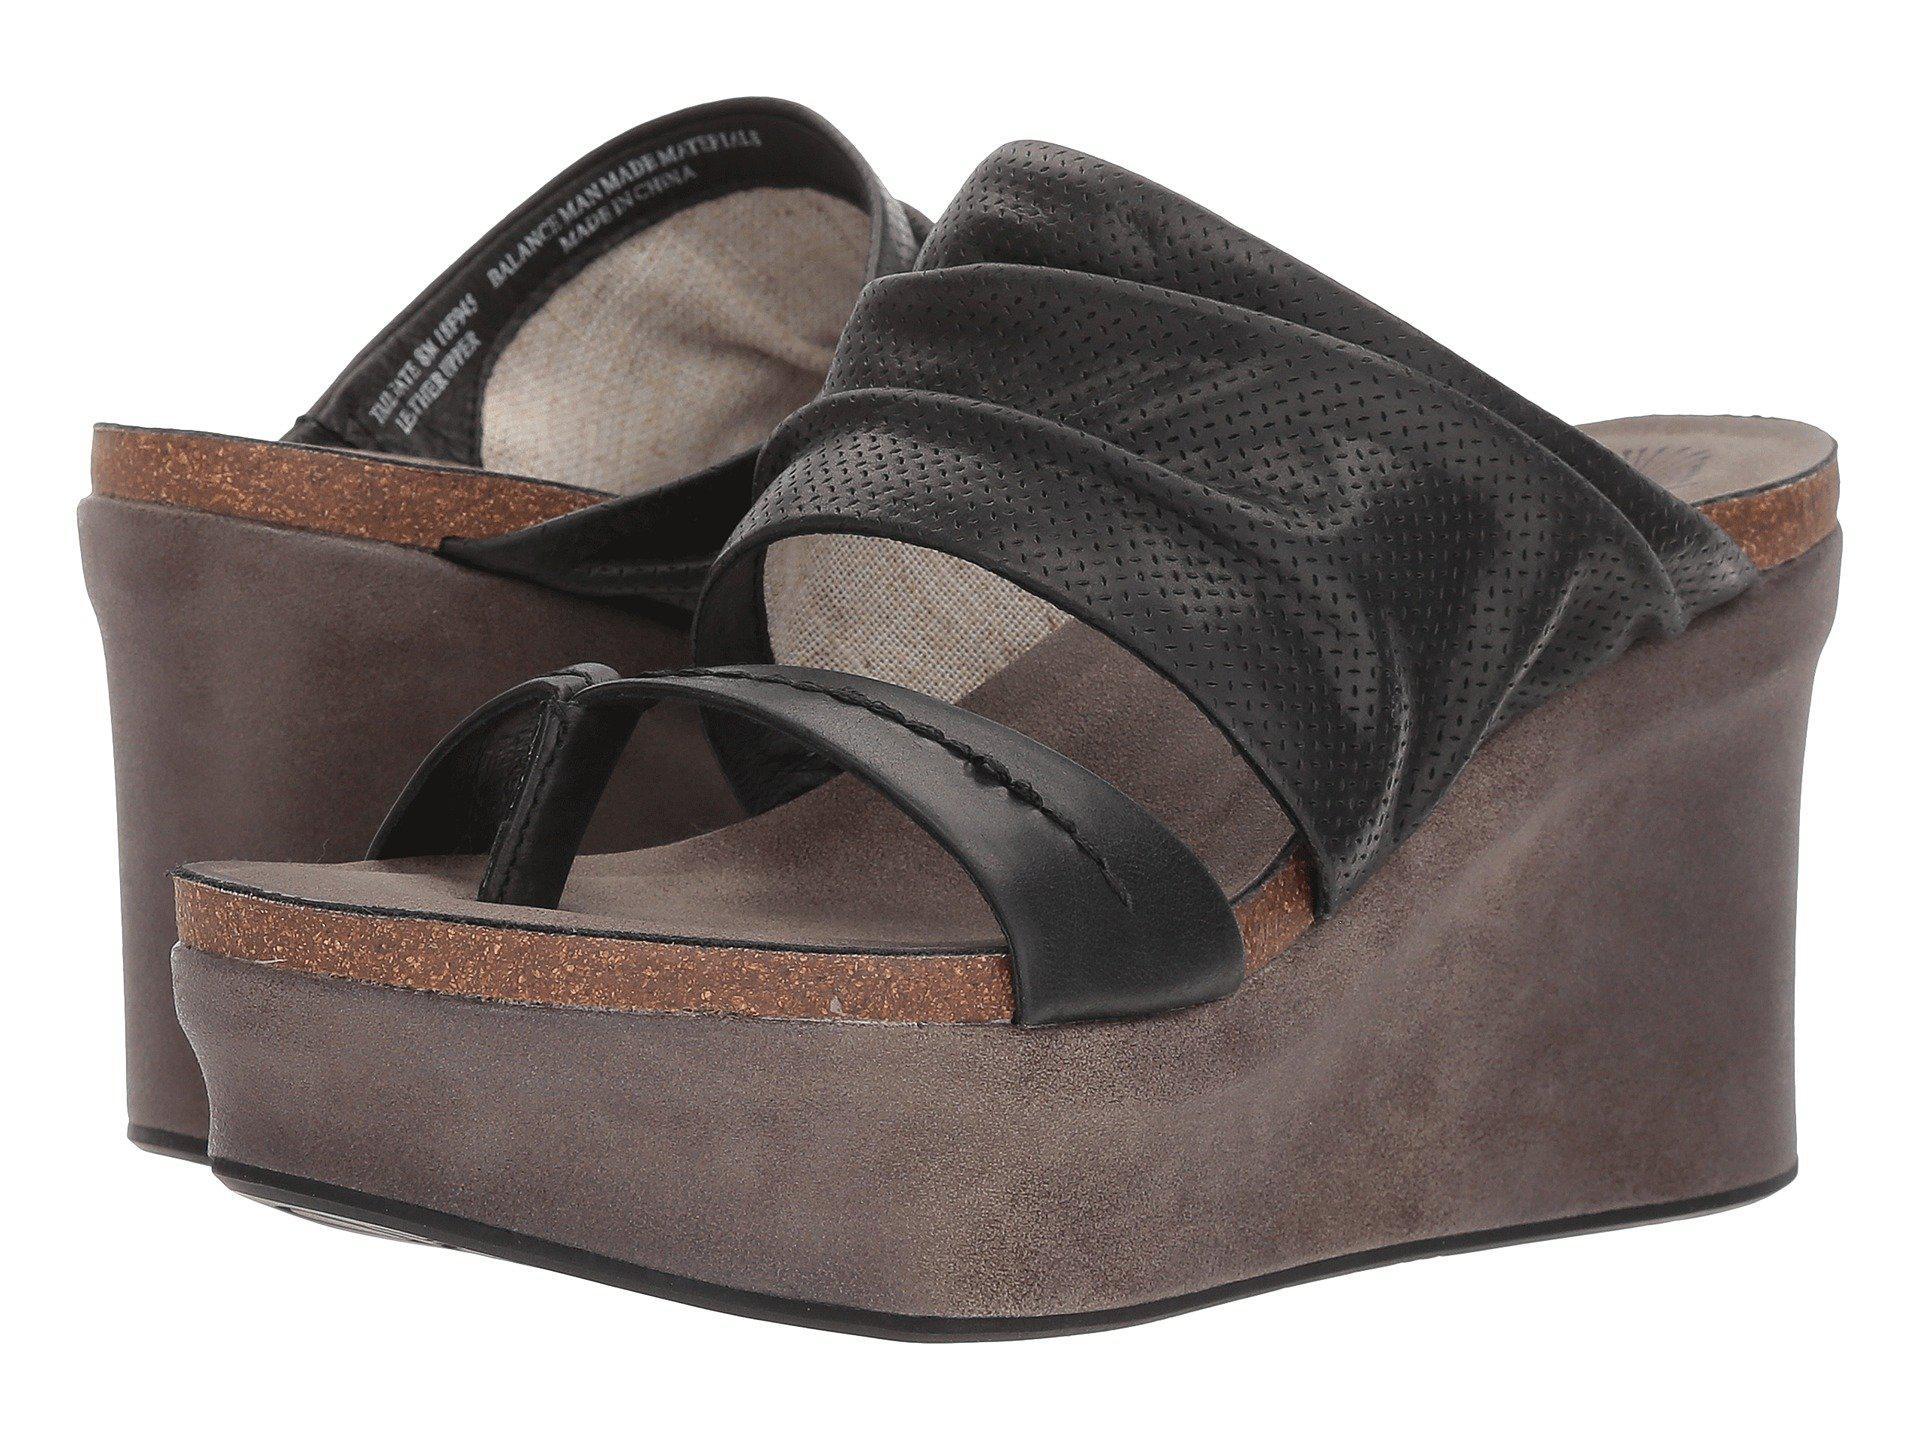 bc6e7cae8f5 Lyst - Otbt Tailgate Platform Sandals in Black - Save 1%